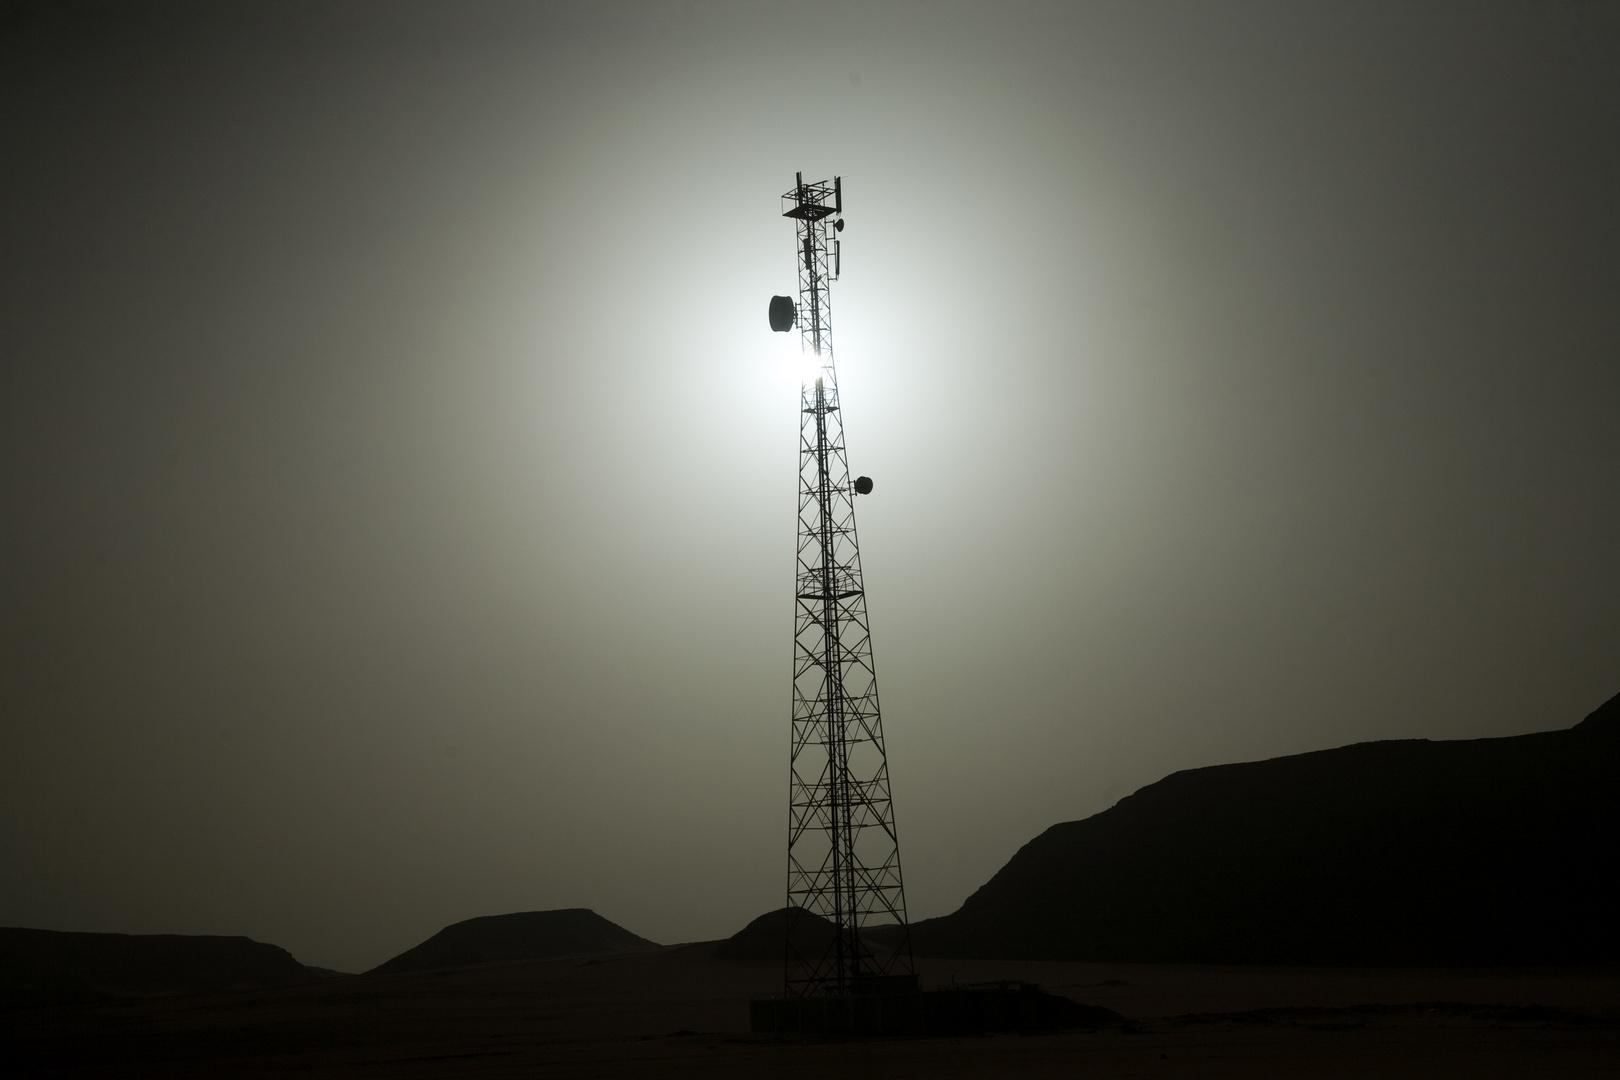 Mobilnetzversorgung